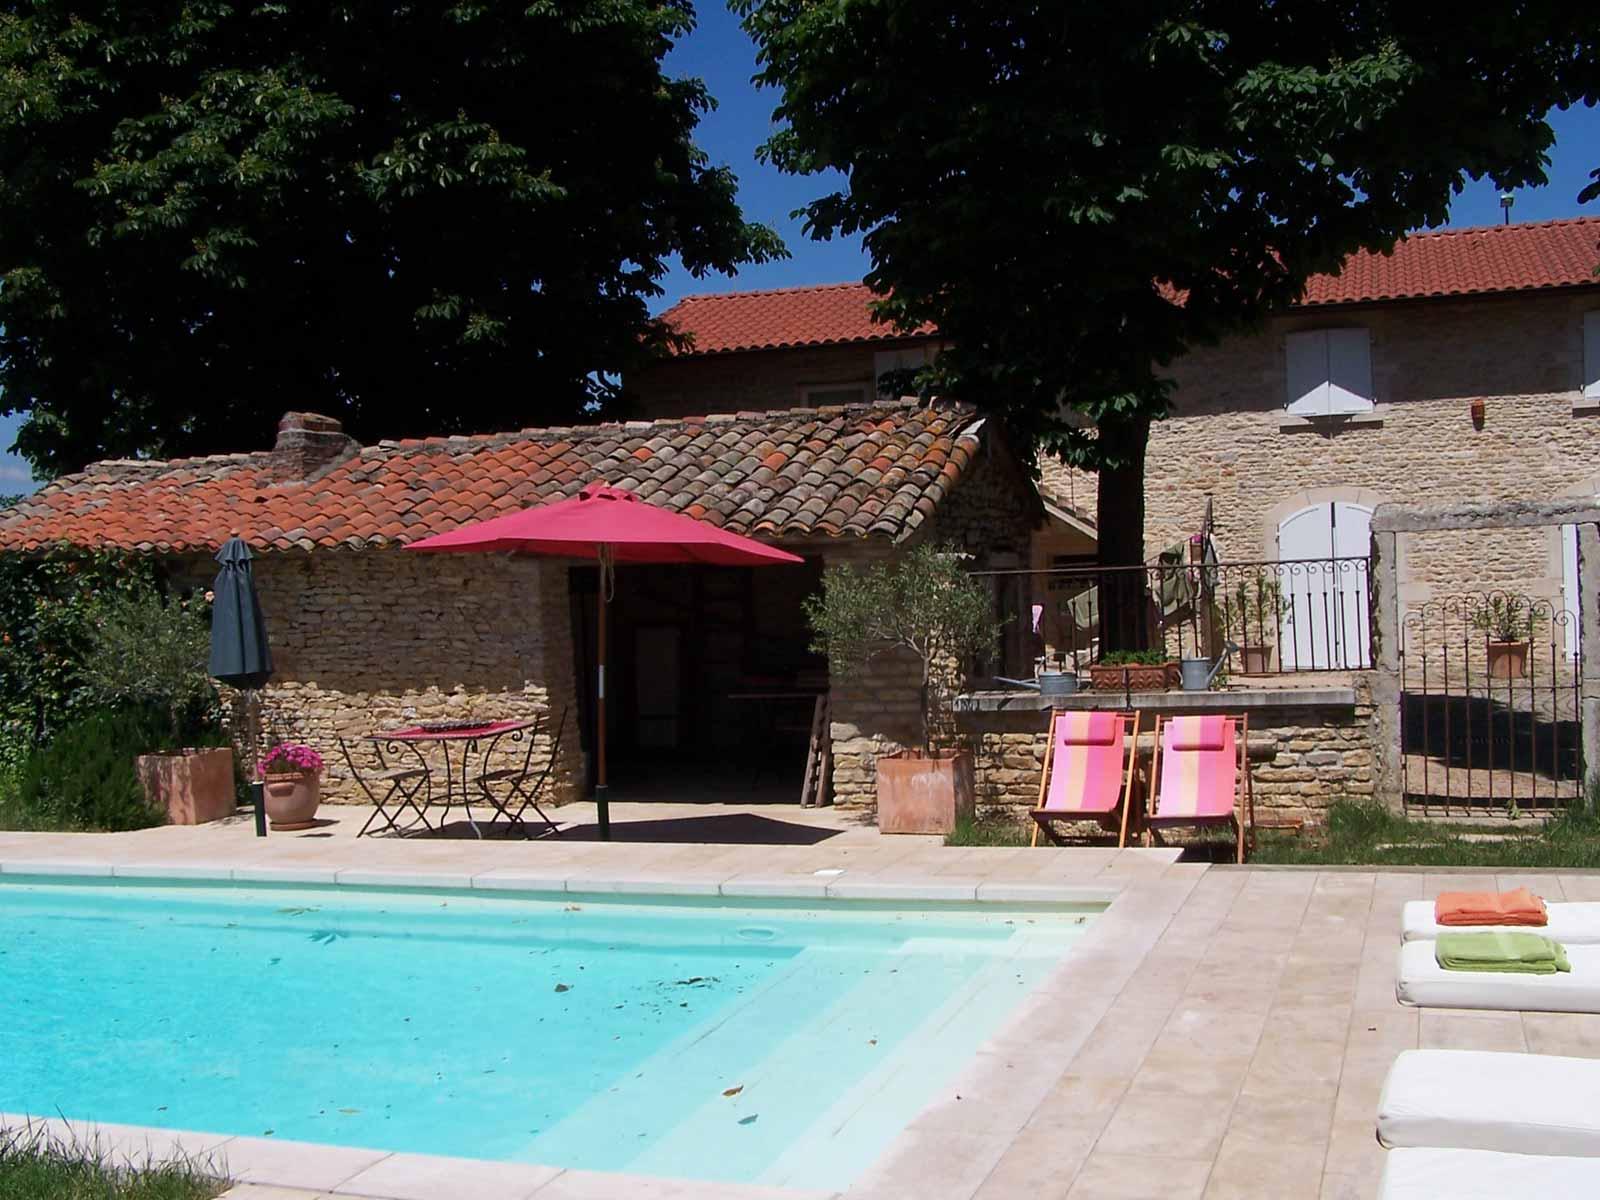 chambres-d-hote-piscine-beaujolais